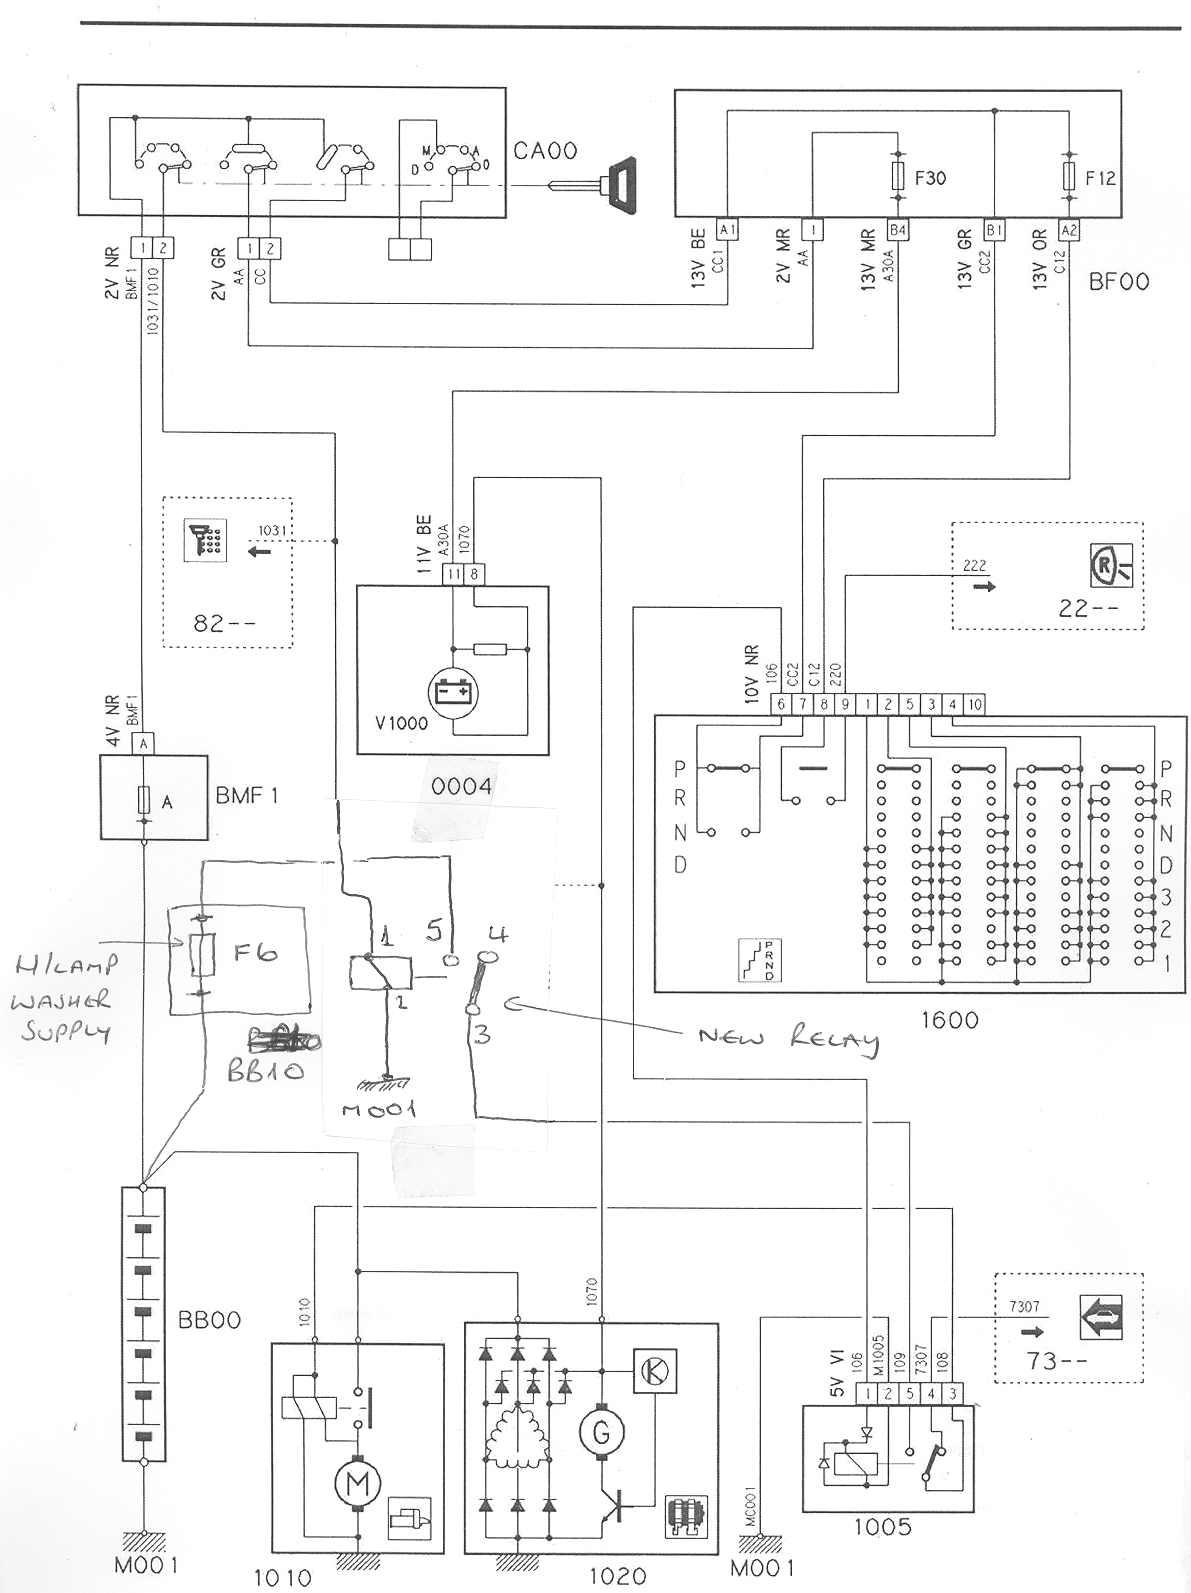 mk1es9j4startermod?resize=665%2C889 diagrams 12501674 peugeot partner wiring diagram peugeot expert citroen c5 wiring diagram pdf at gsmportal.co